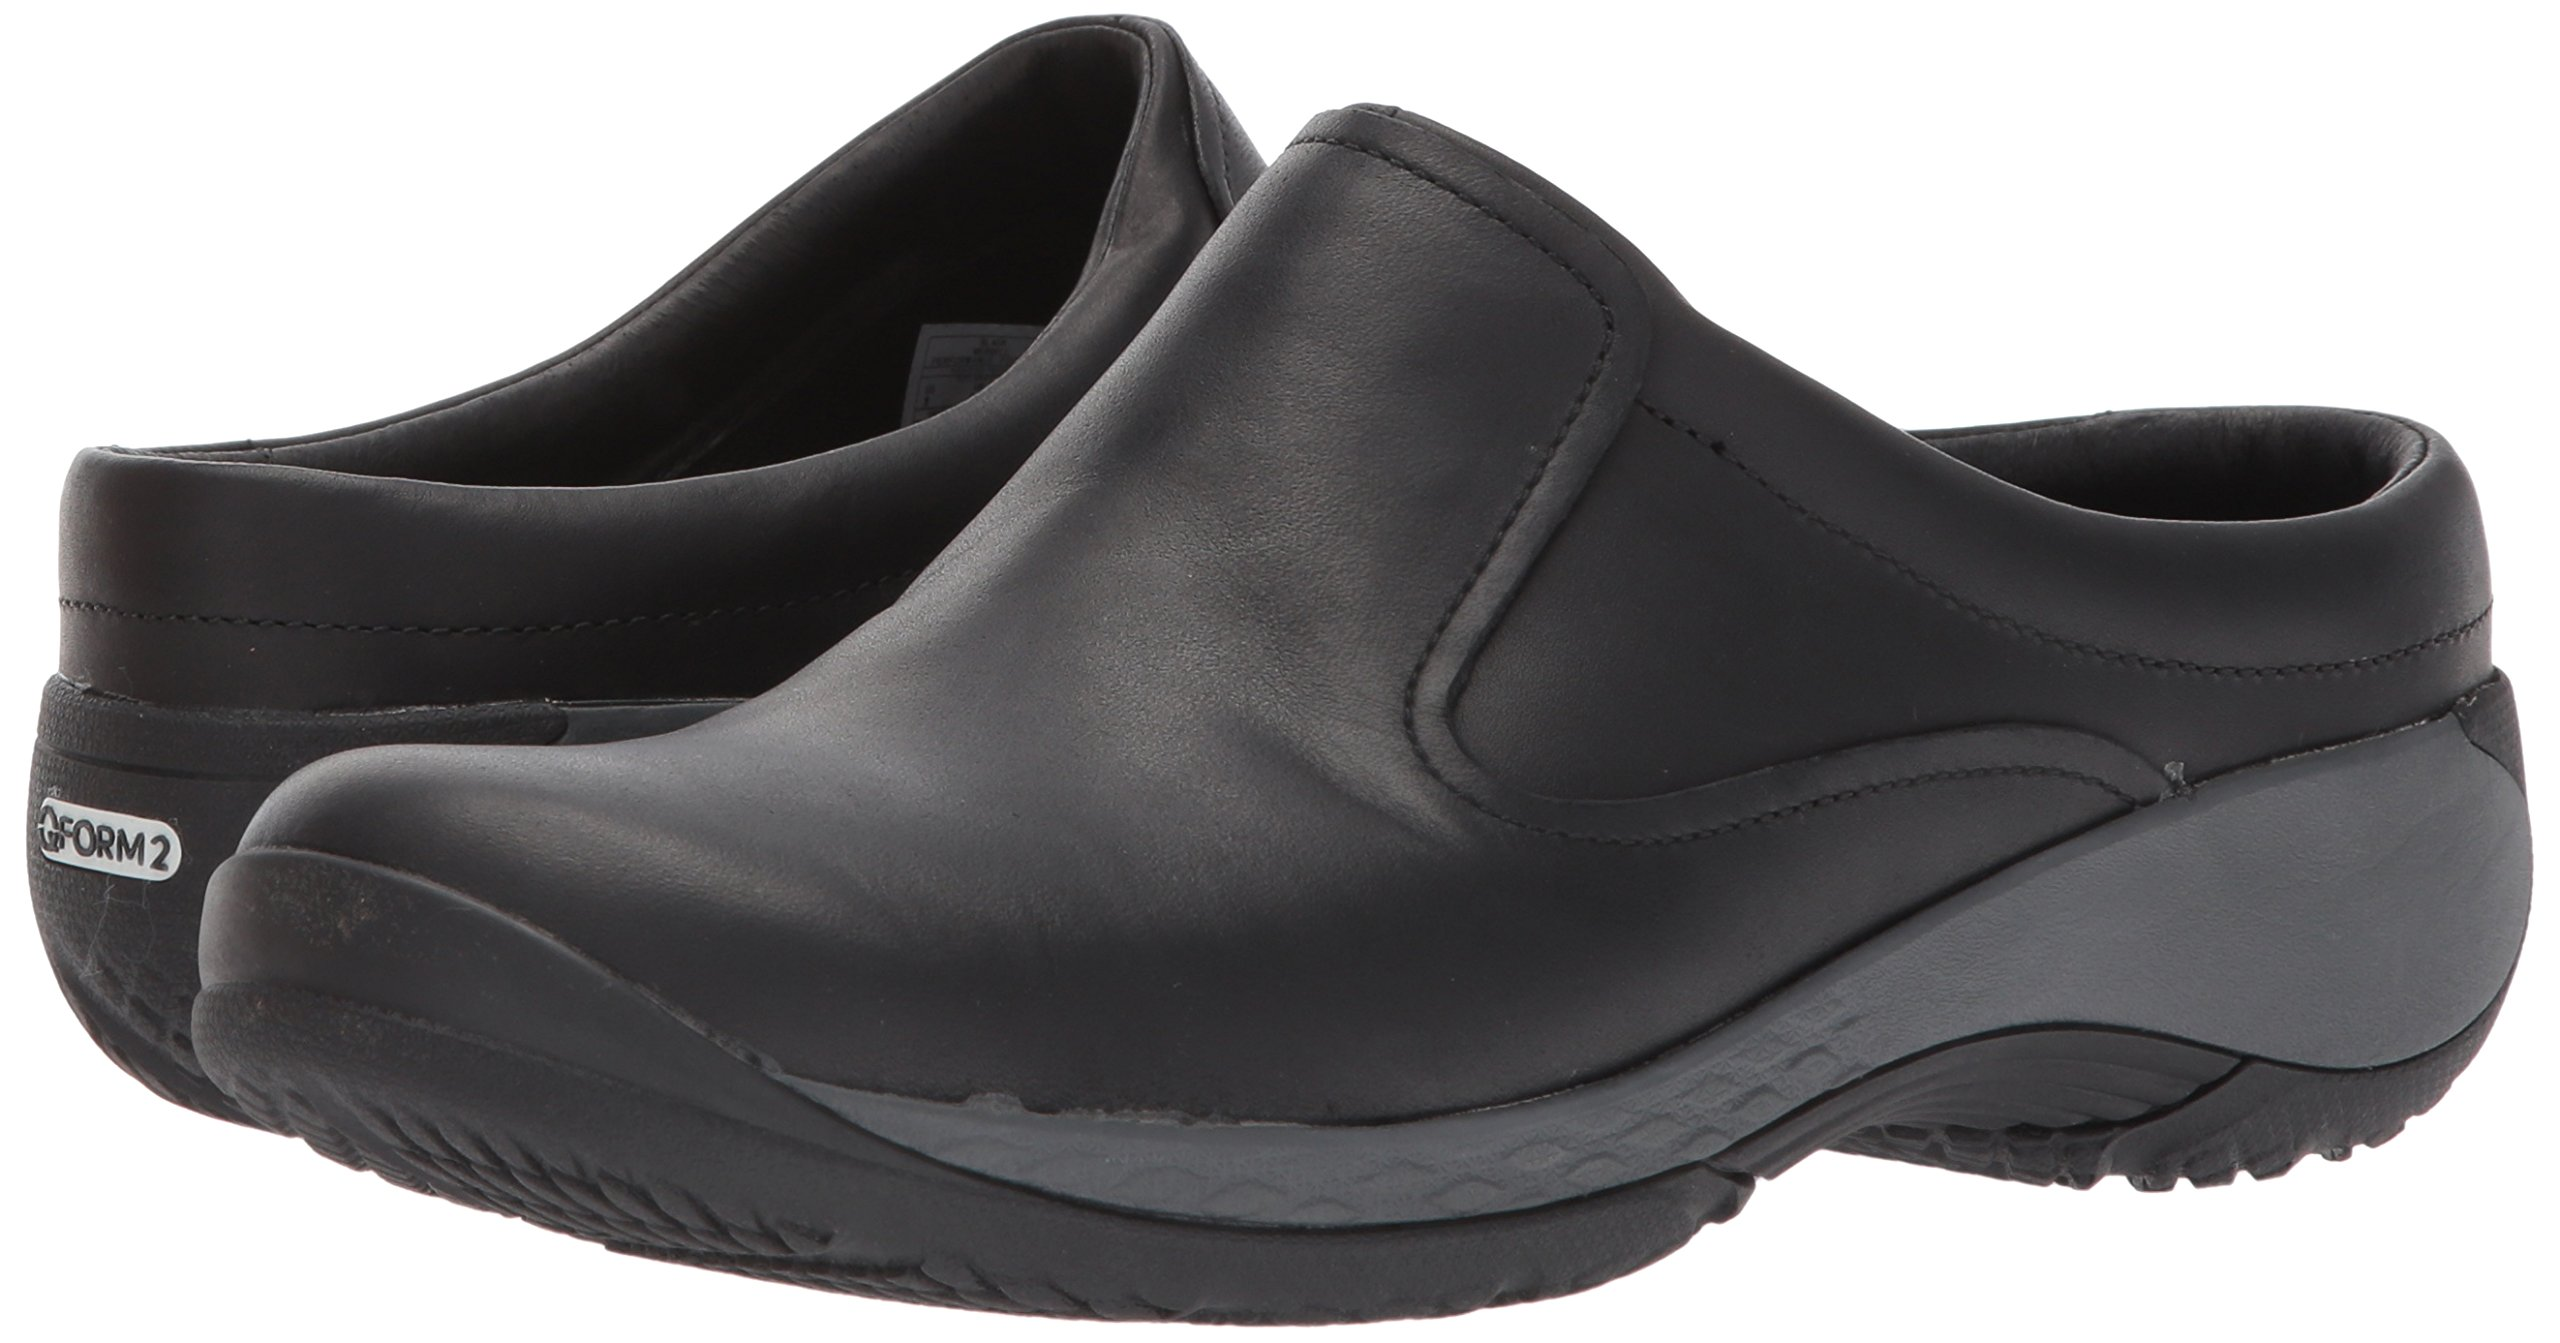 Merrell Leather Slip-On Clogs Encore Q2 Espresso Brown Size 6W Wide Women/'s